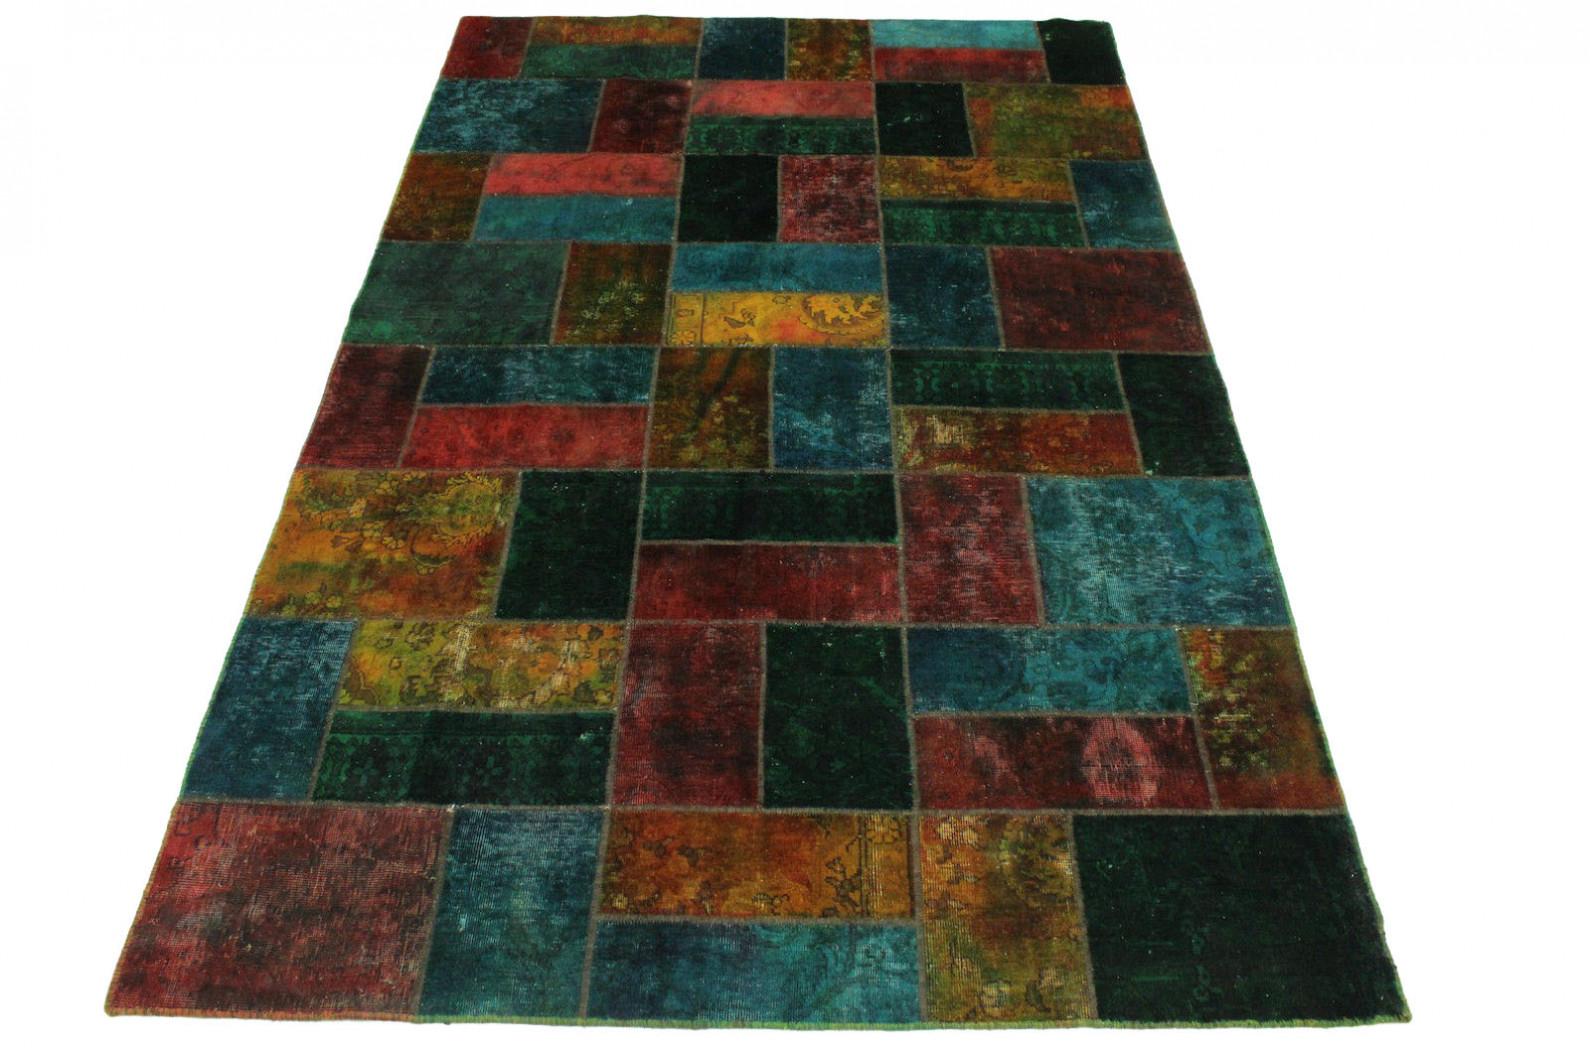 patchwork teppich gr n rot curry in 310x200cm 1001 1934 bei kaufen. Black Bedroom Furniture Sets. Home Design Ideas